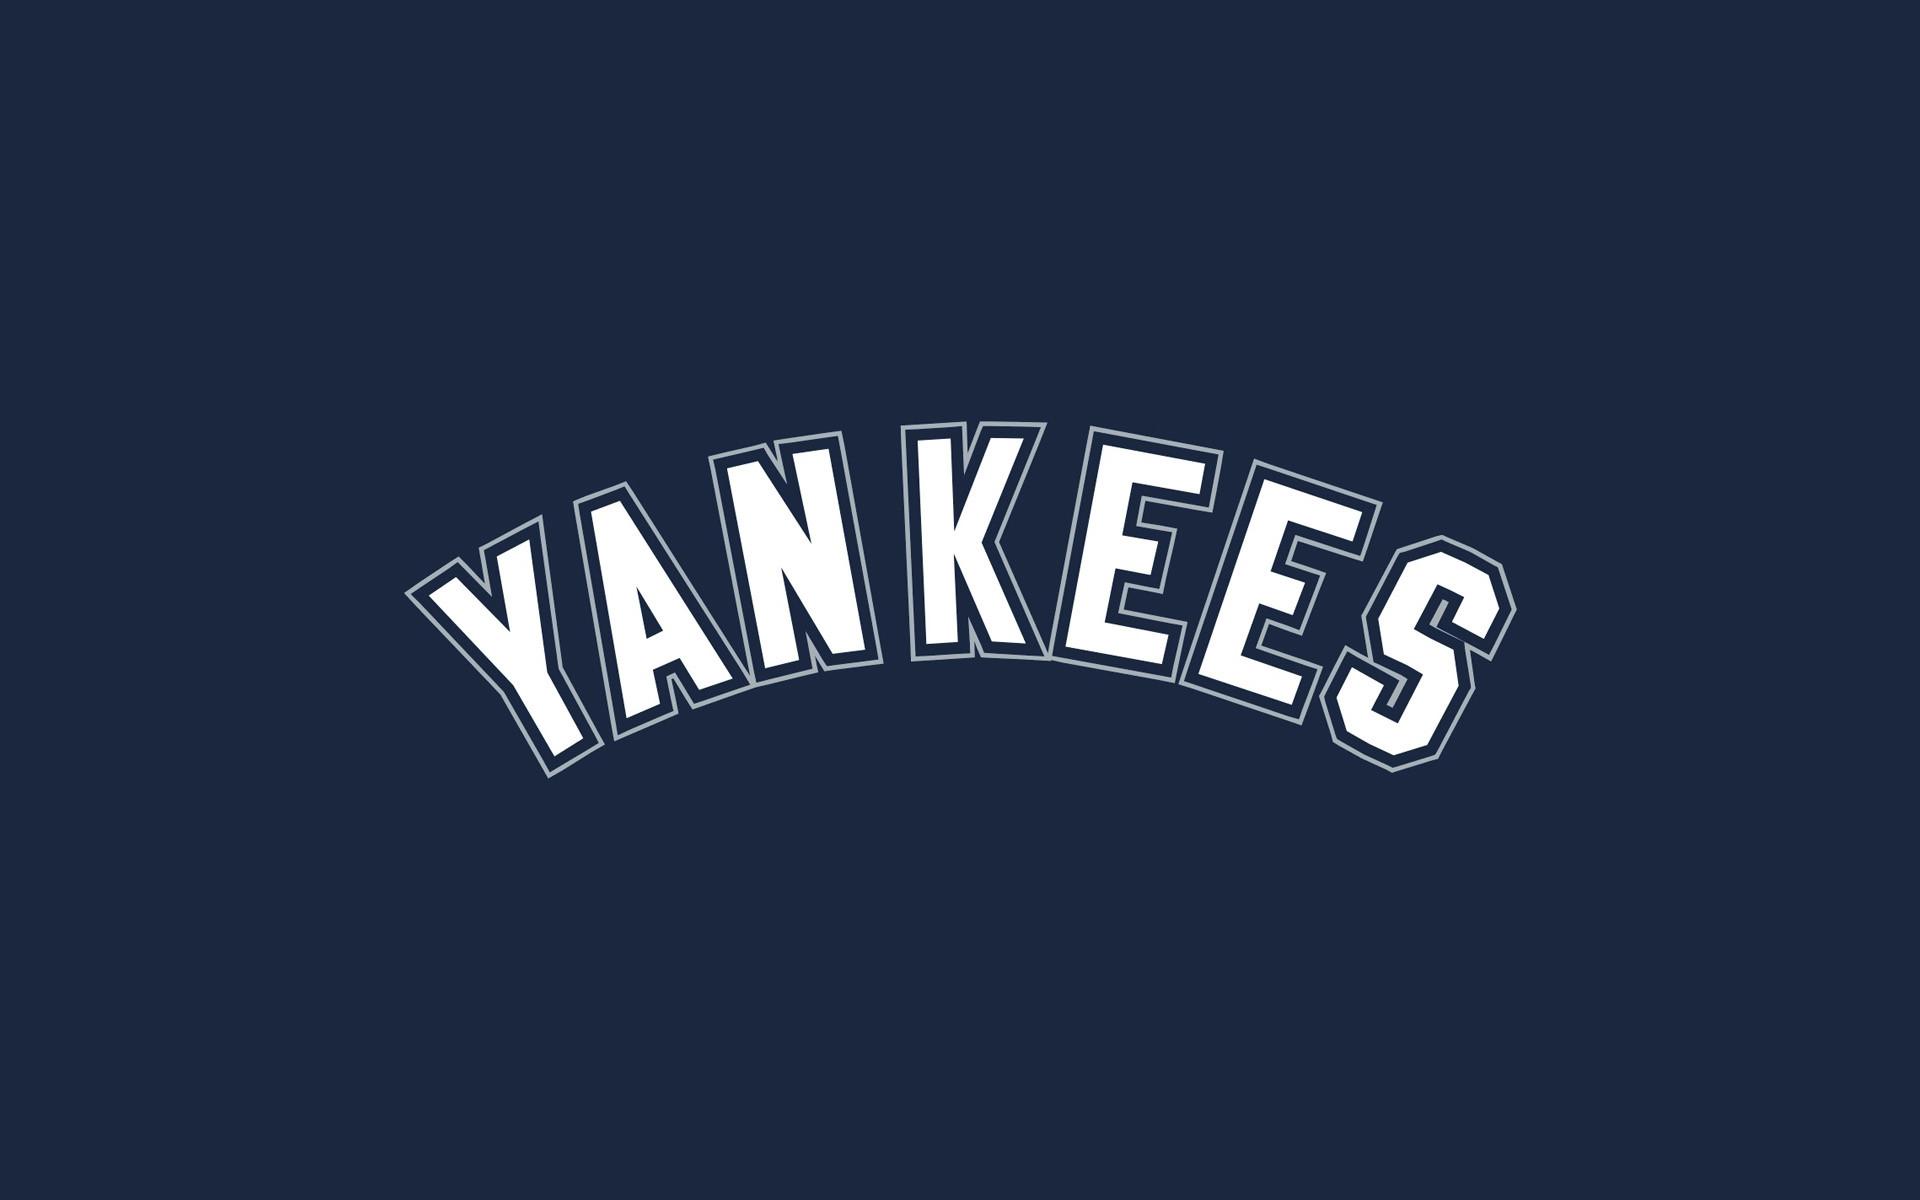 New York Yankees Wallpapers HD   HD Wallpapers   Pinterest   Wallpaper and  Hd wallpaper